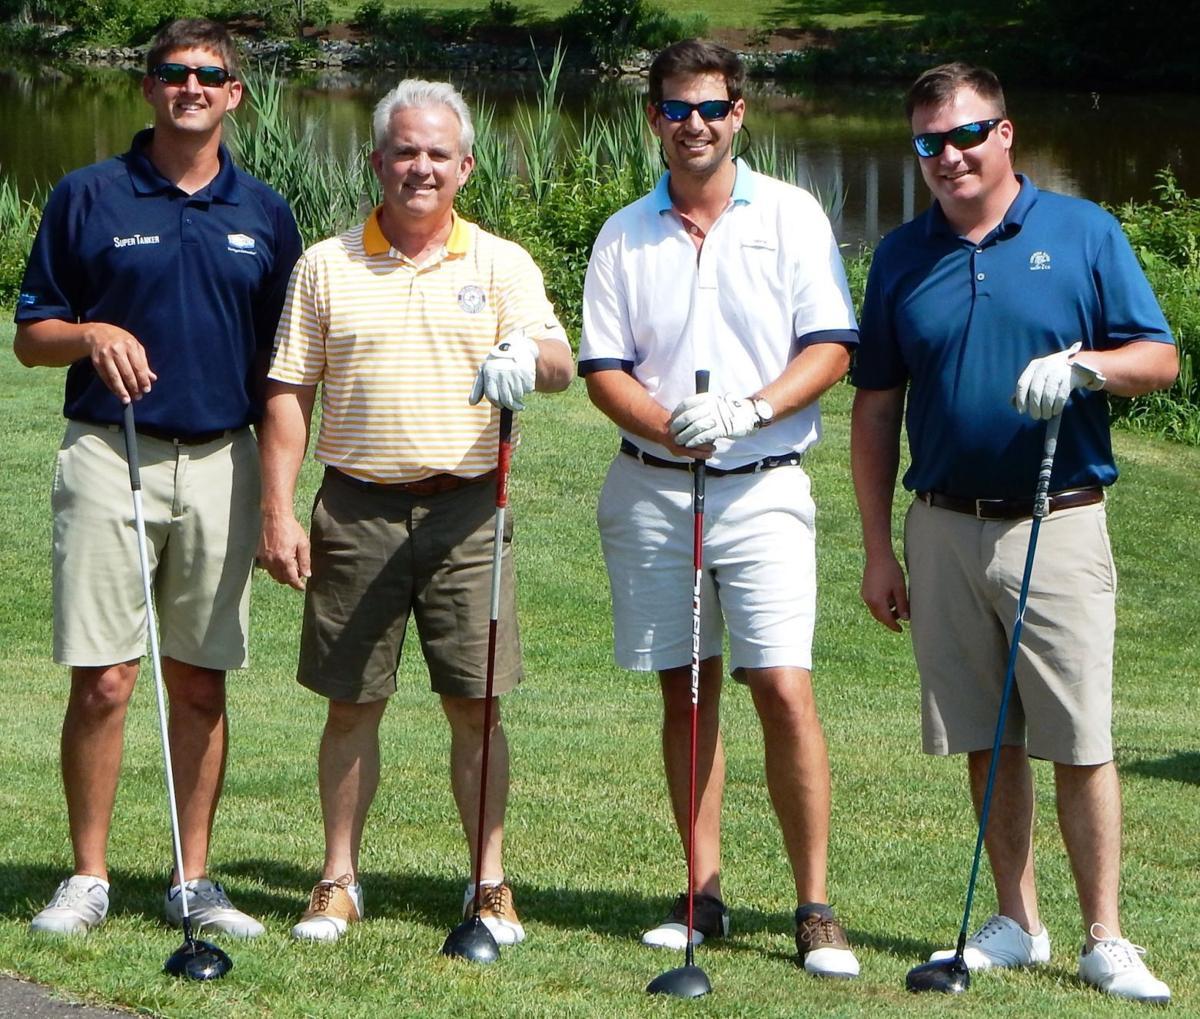 Golf tournament raises $95K to fund chemistry analyzer for lab